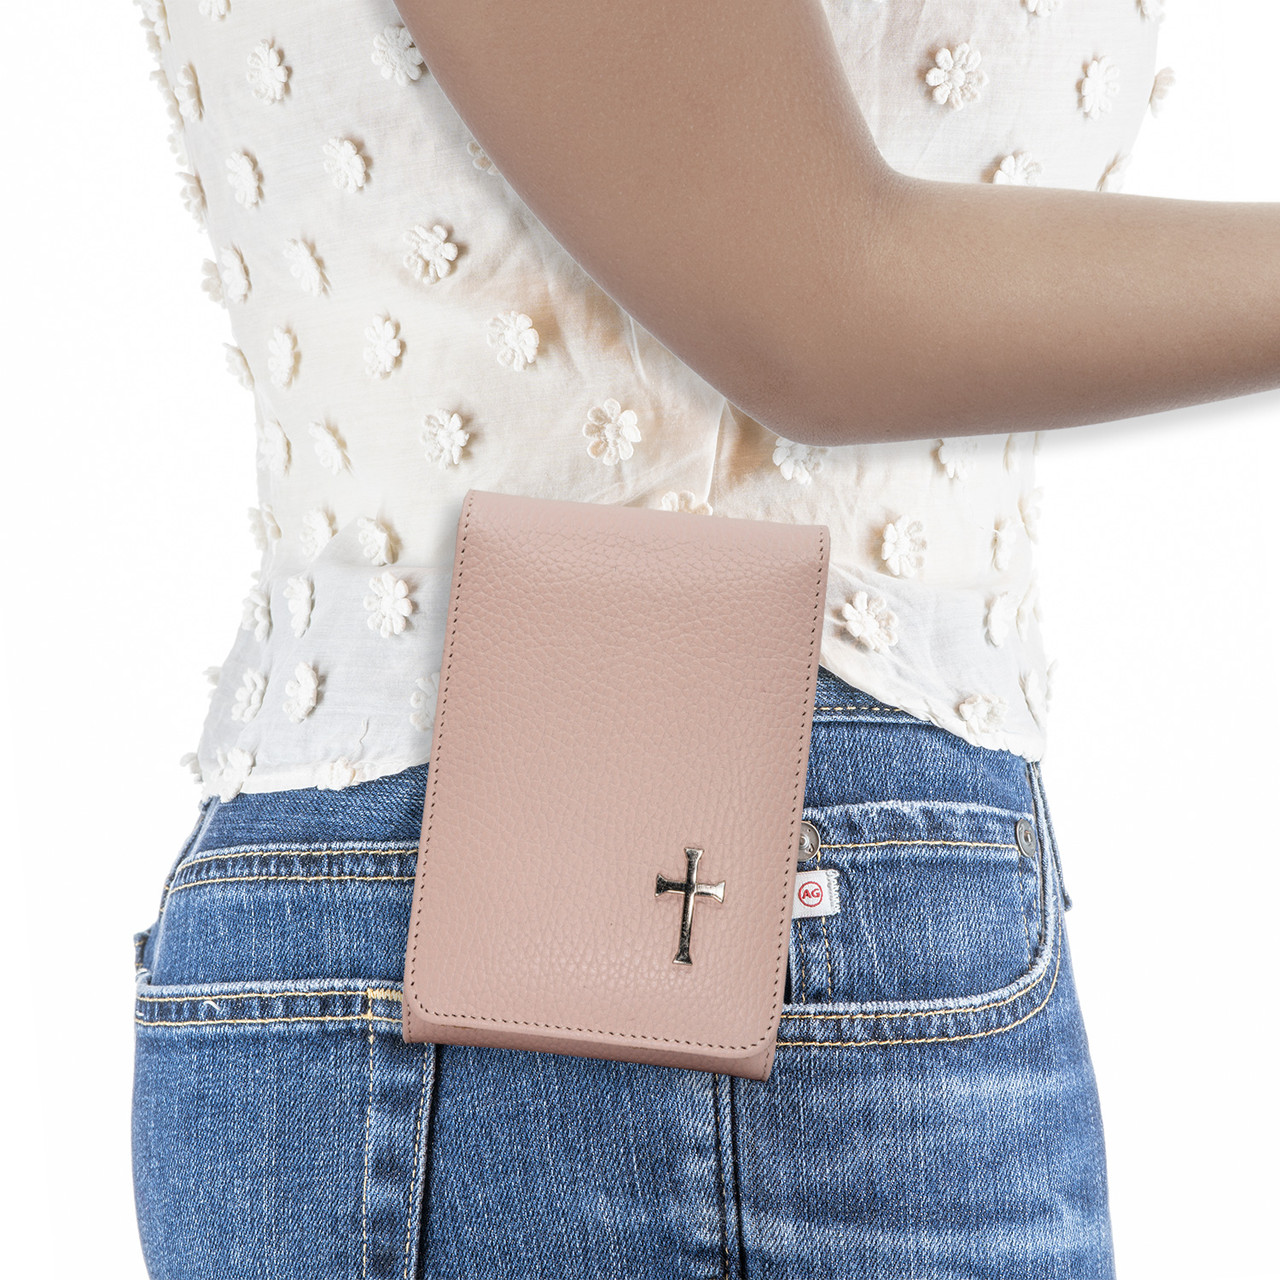 Glock 48 Pink Carry Faithfully Cross Holster